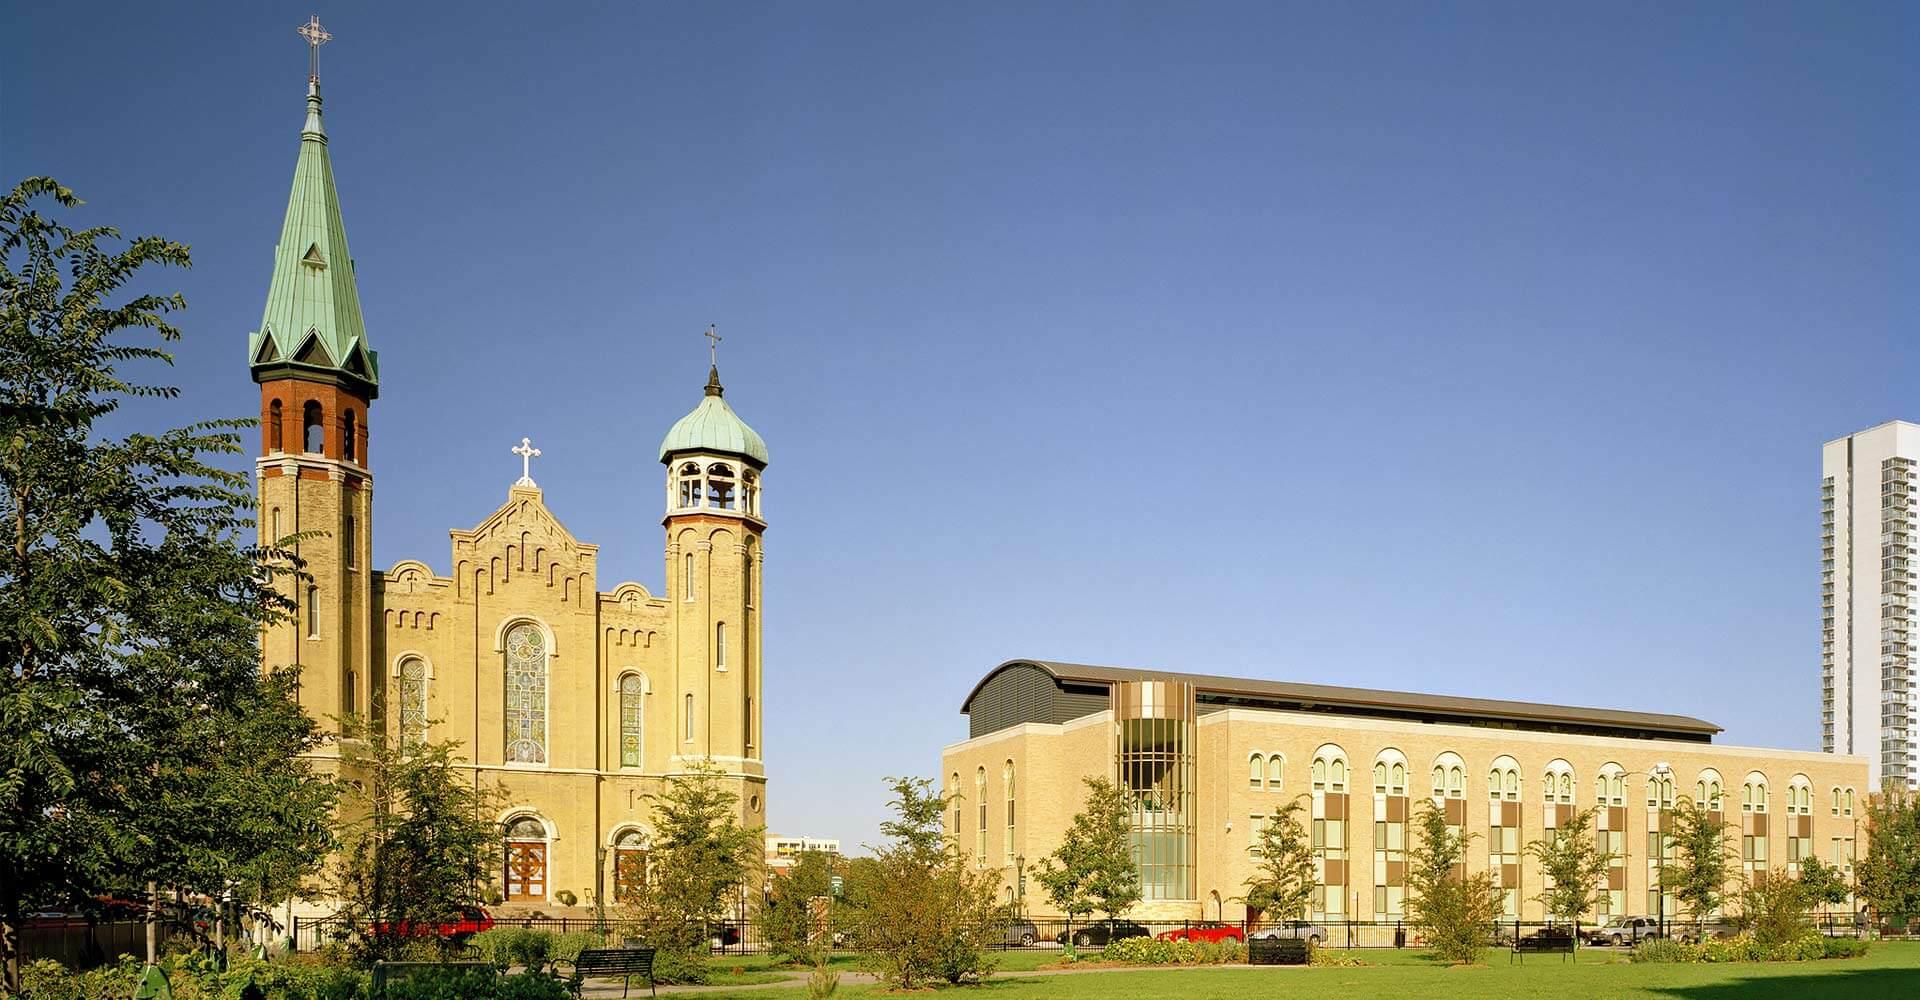 The Frances Xavier Warde School | Old St. Patrick's Campus